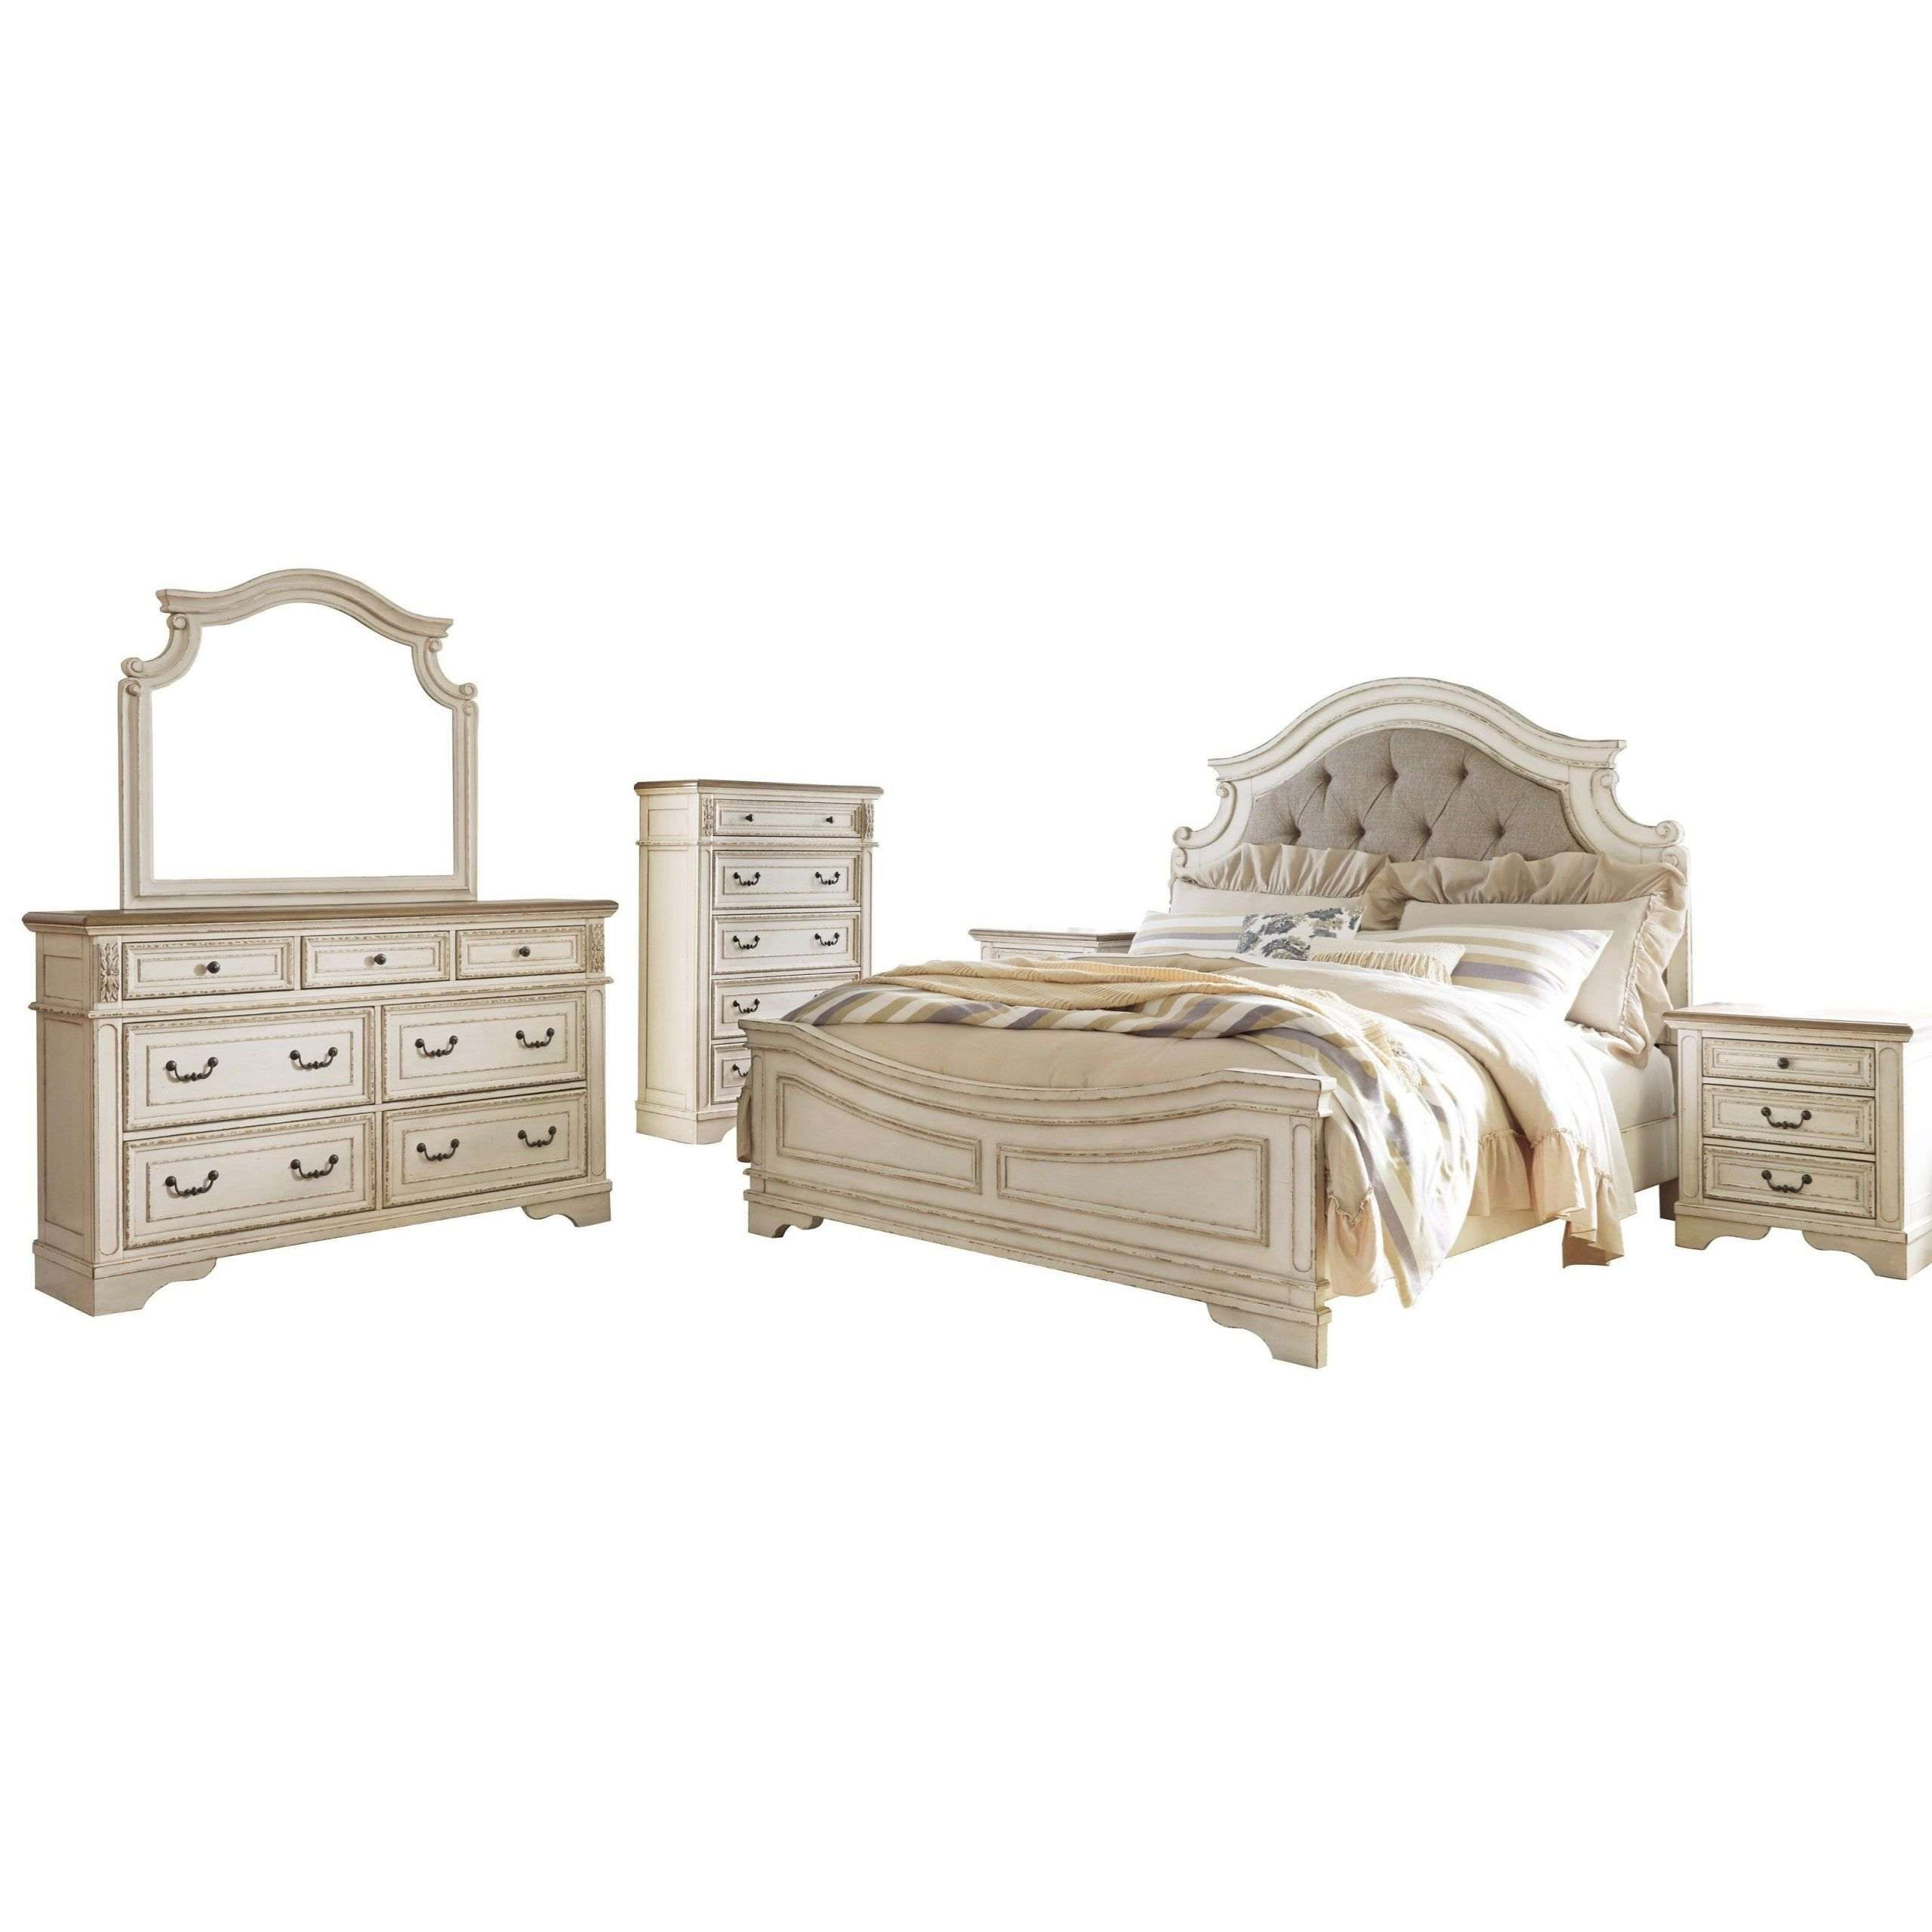 Queen Bedroom Sets With Mattress Di 2020